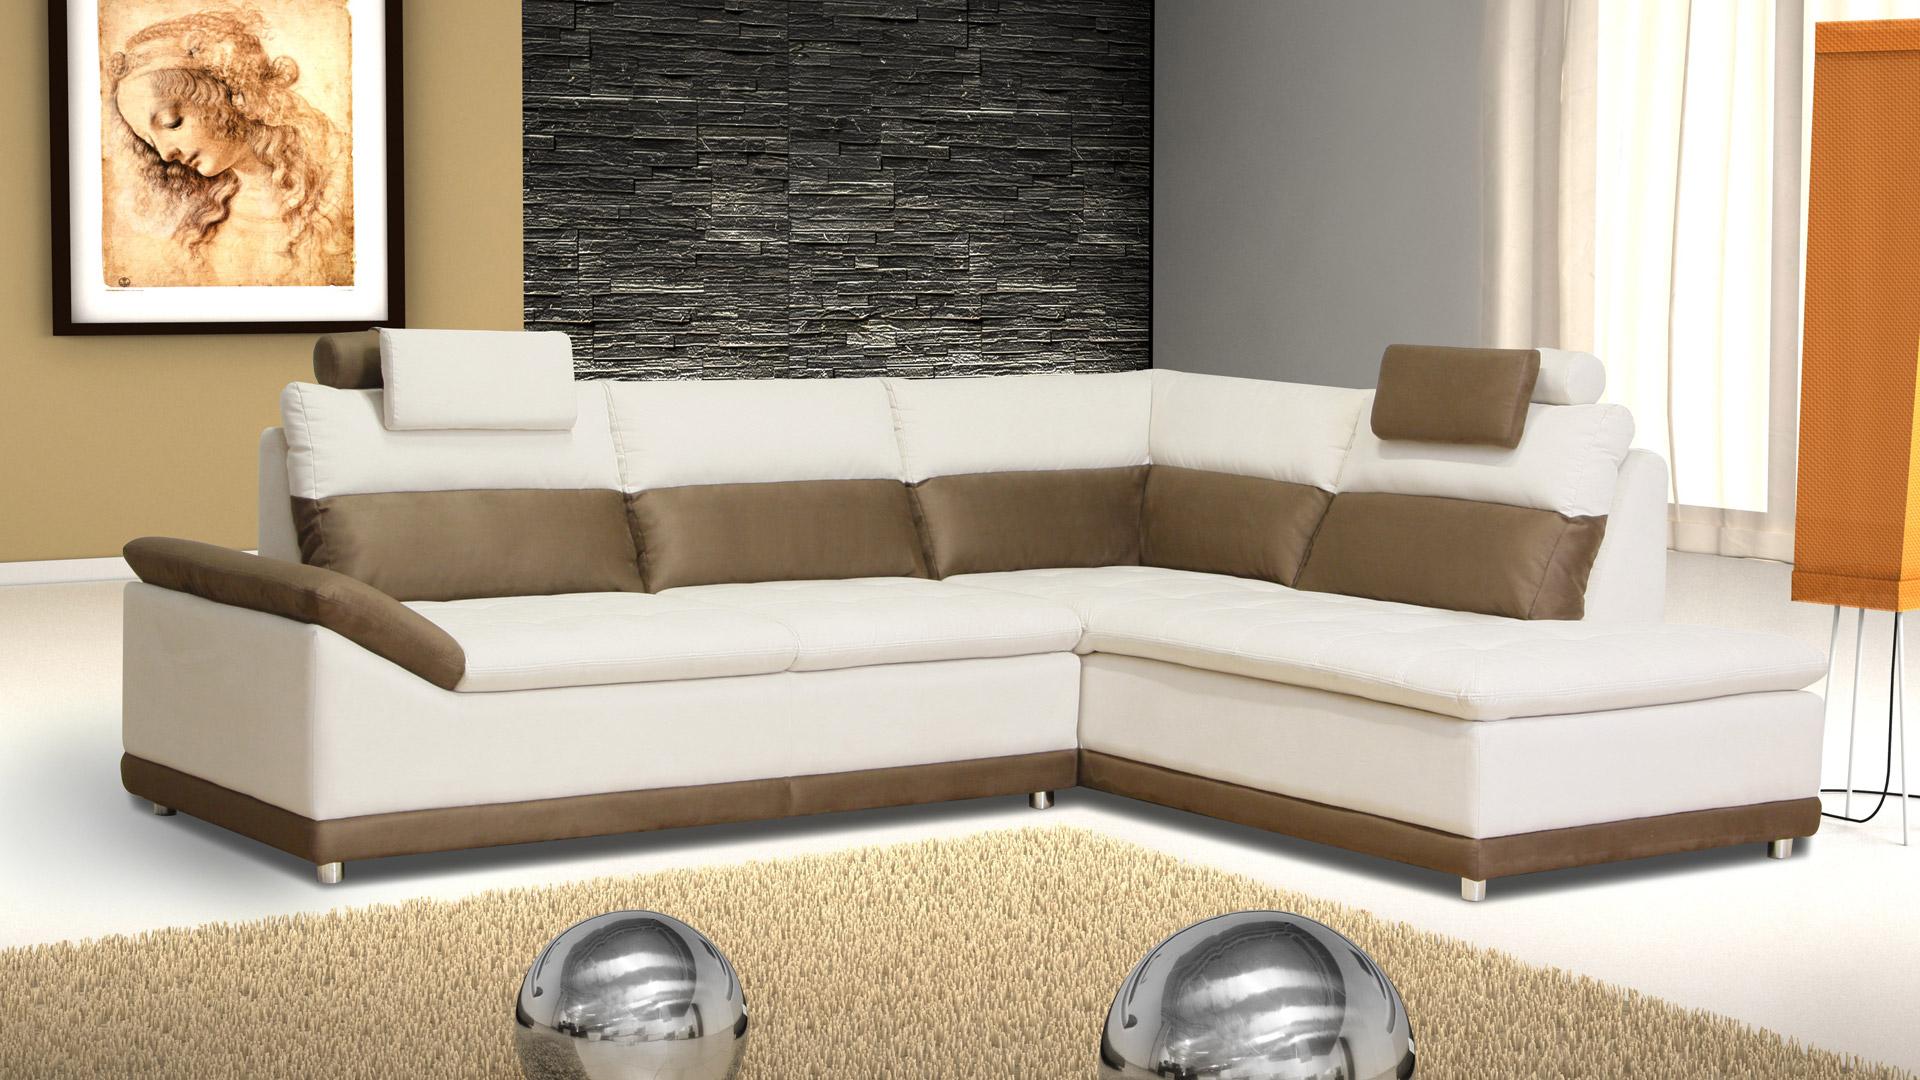 Twins Leisure Furniture Agpol